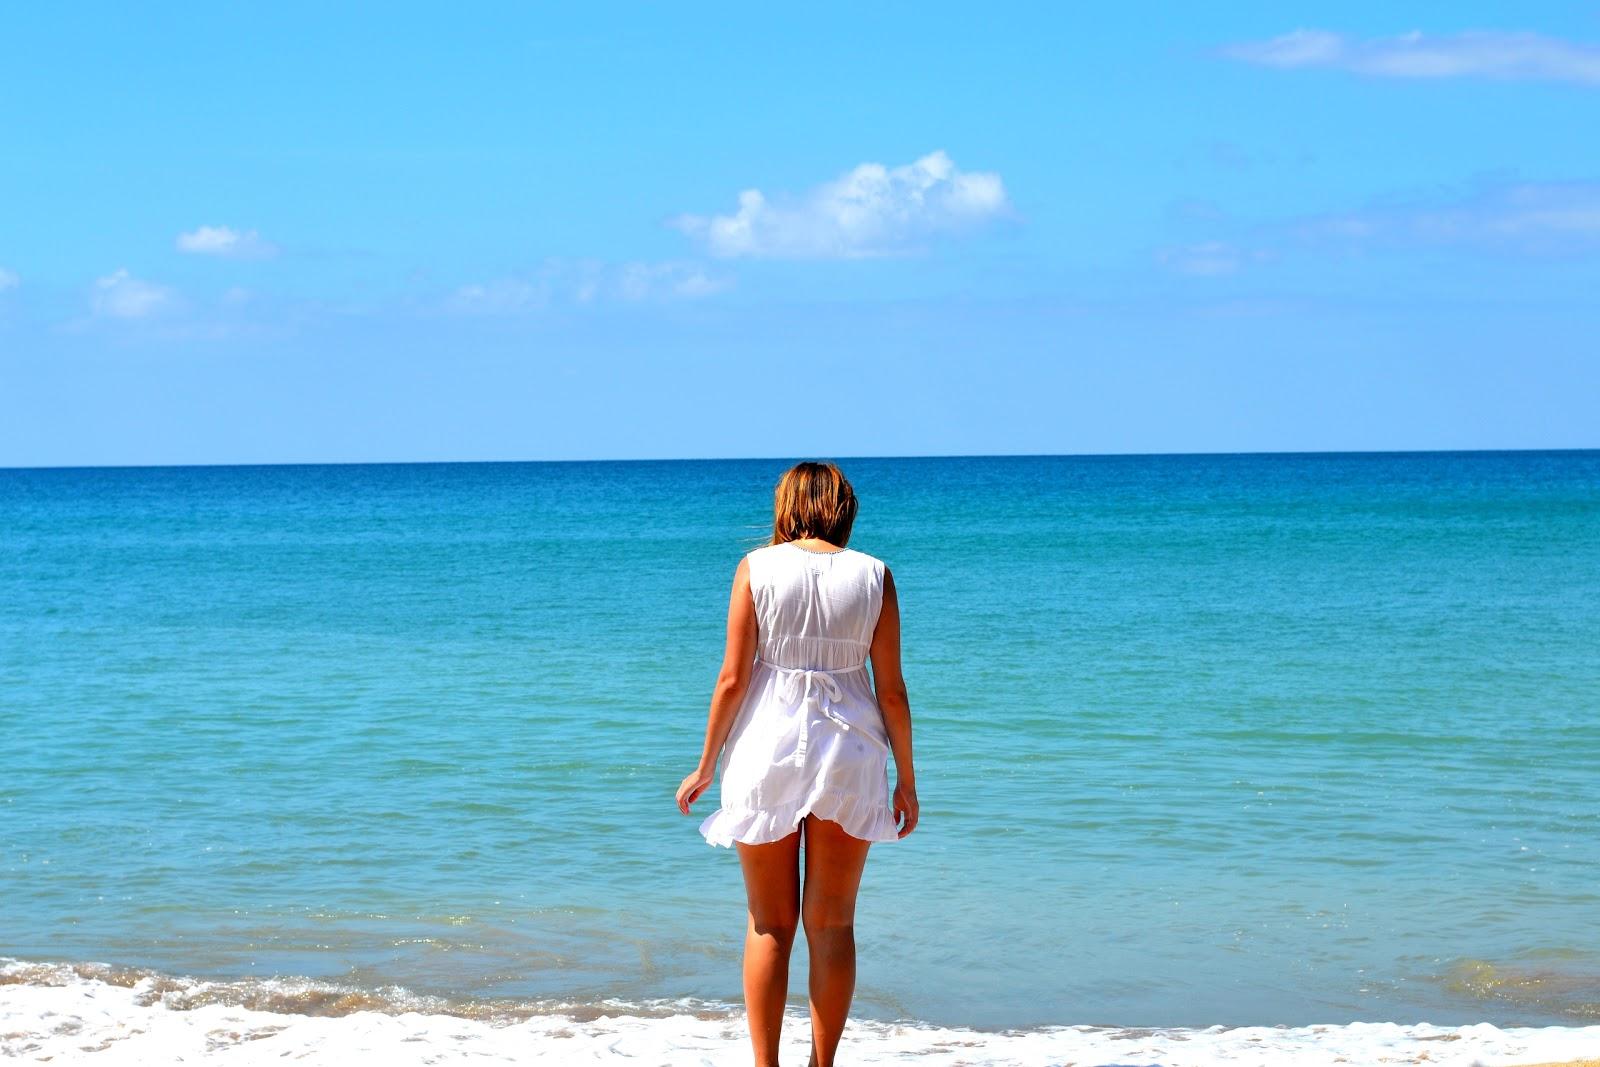 Klong nin beach